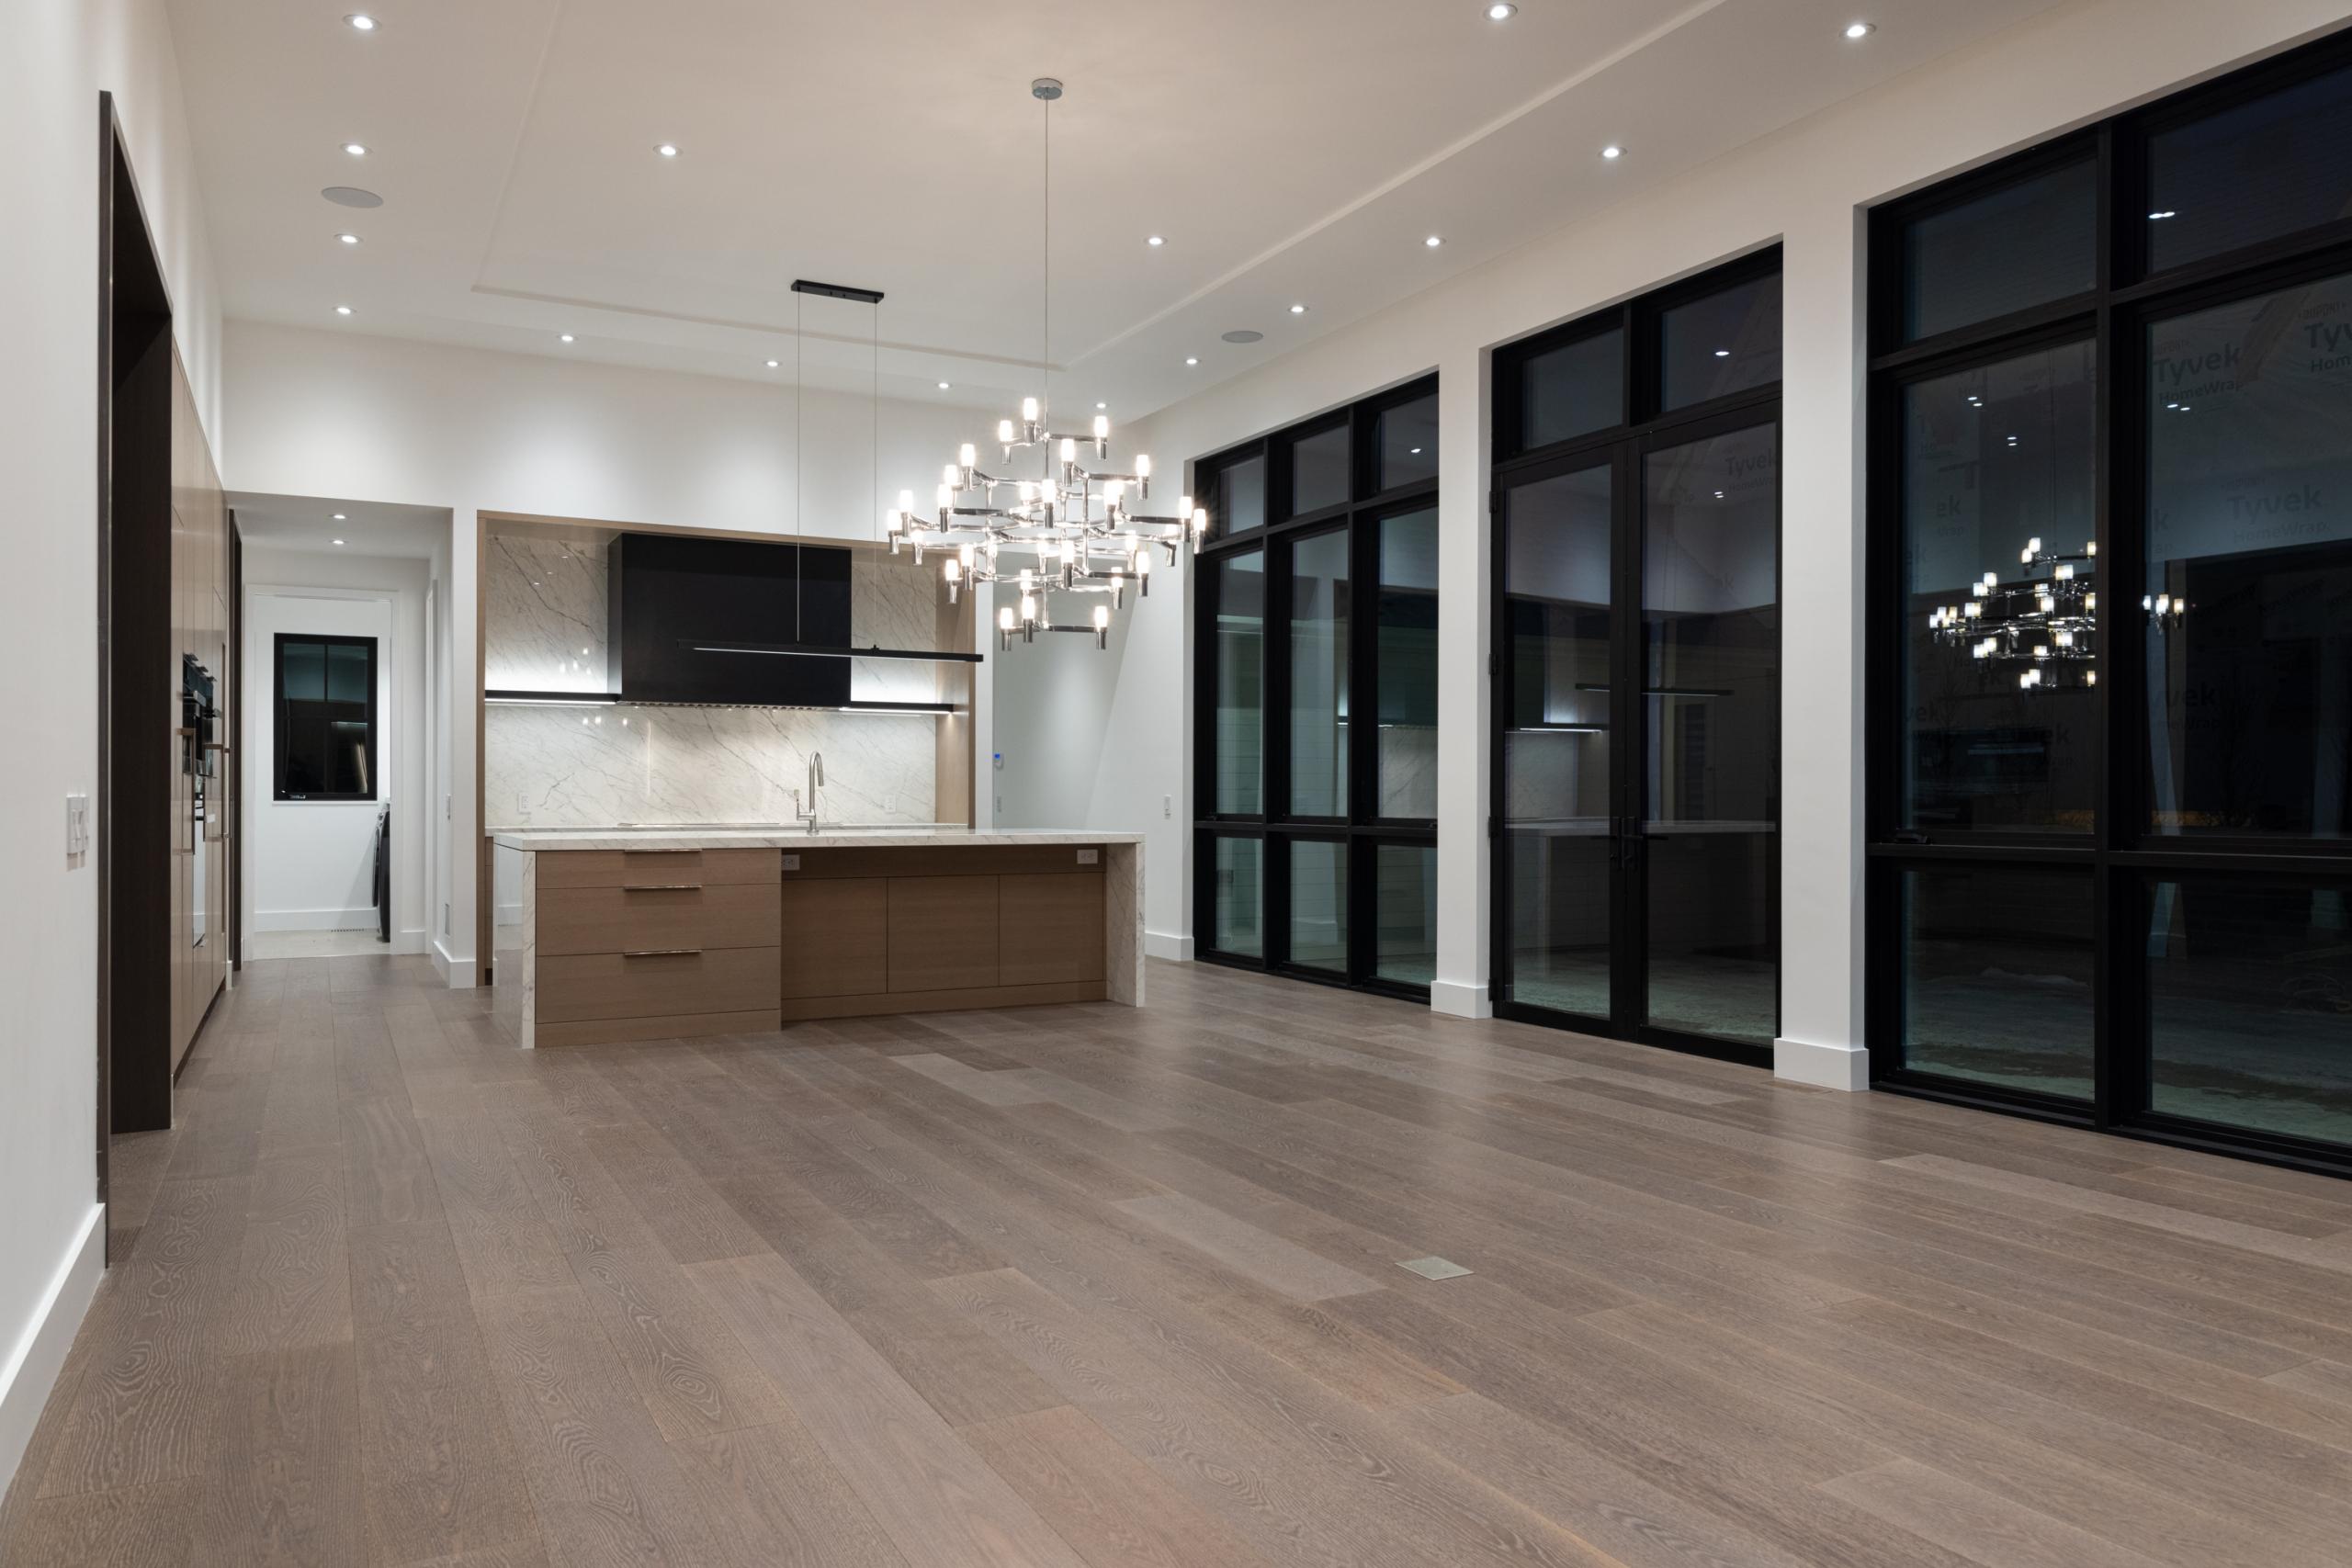 New Construction Home 210 Gloucester Avenue, Old Oakville